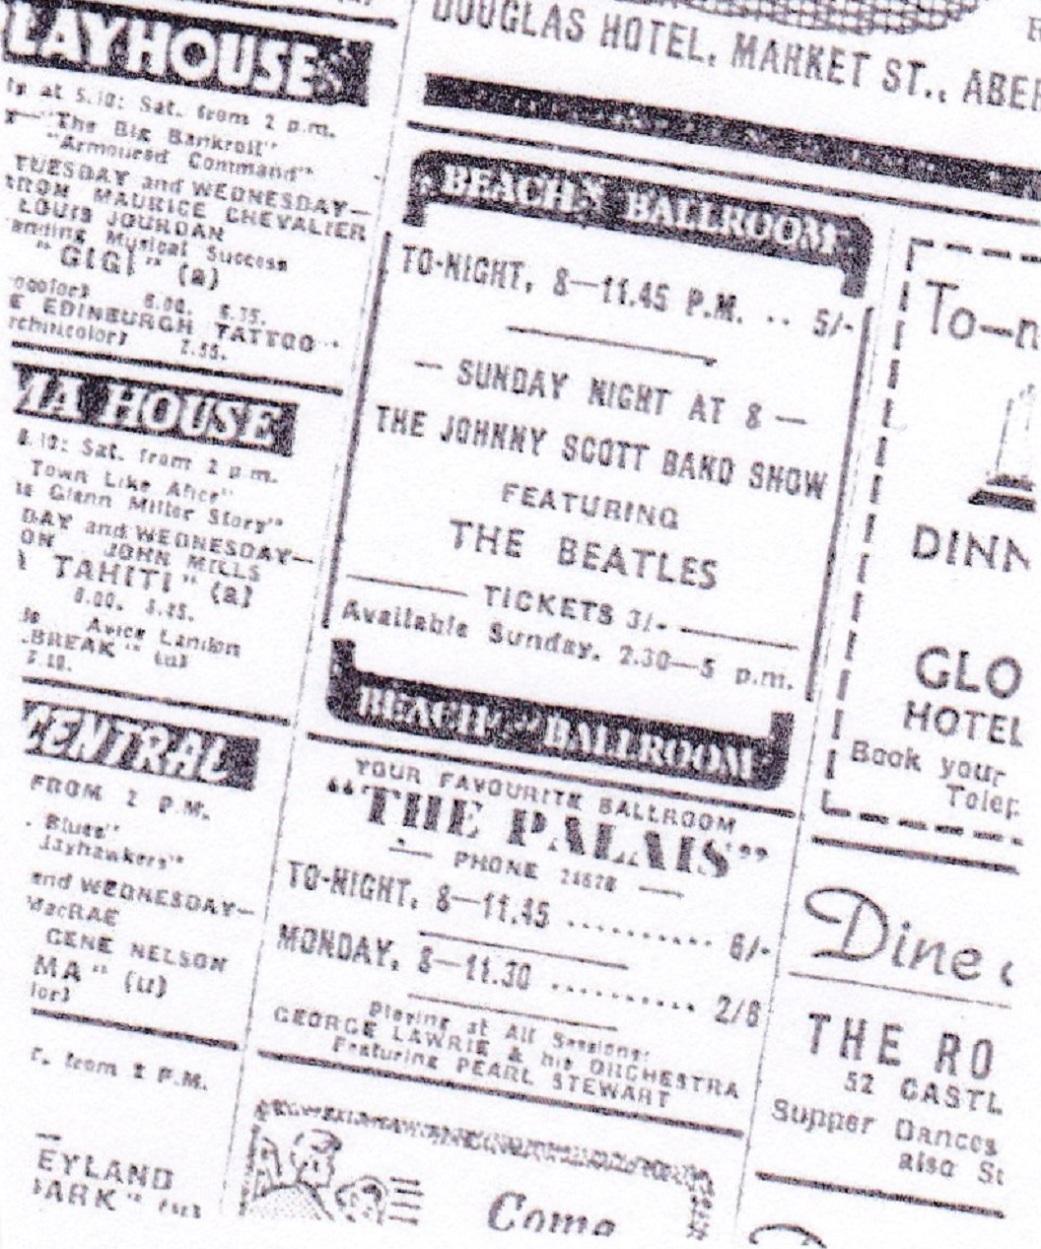 Advert for The Beatles Beach Ballroom Show